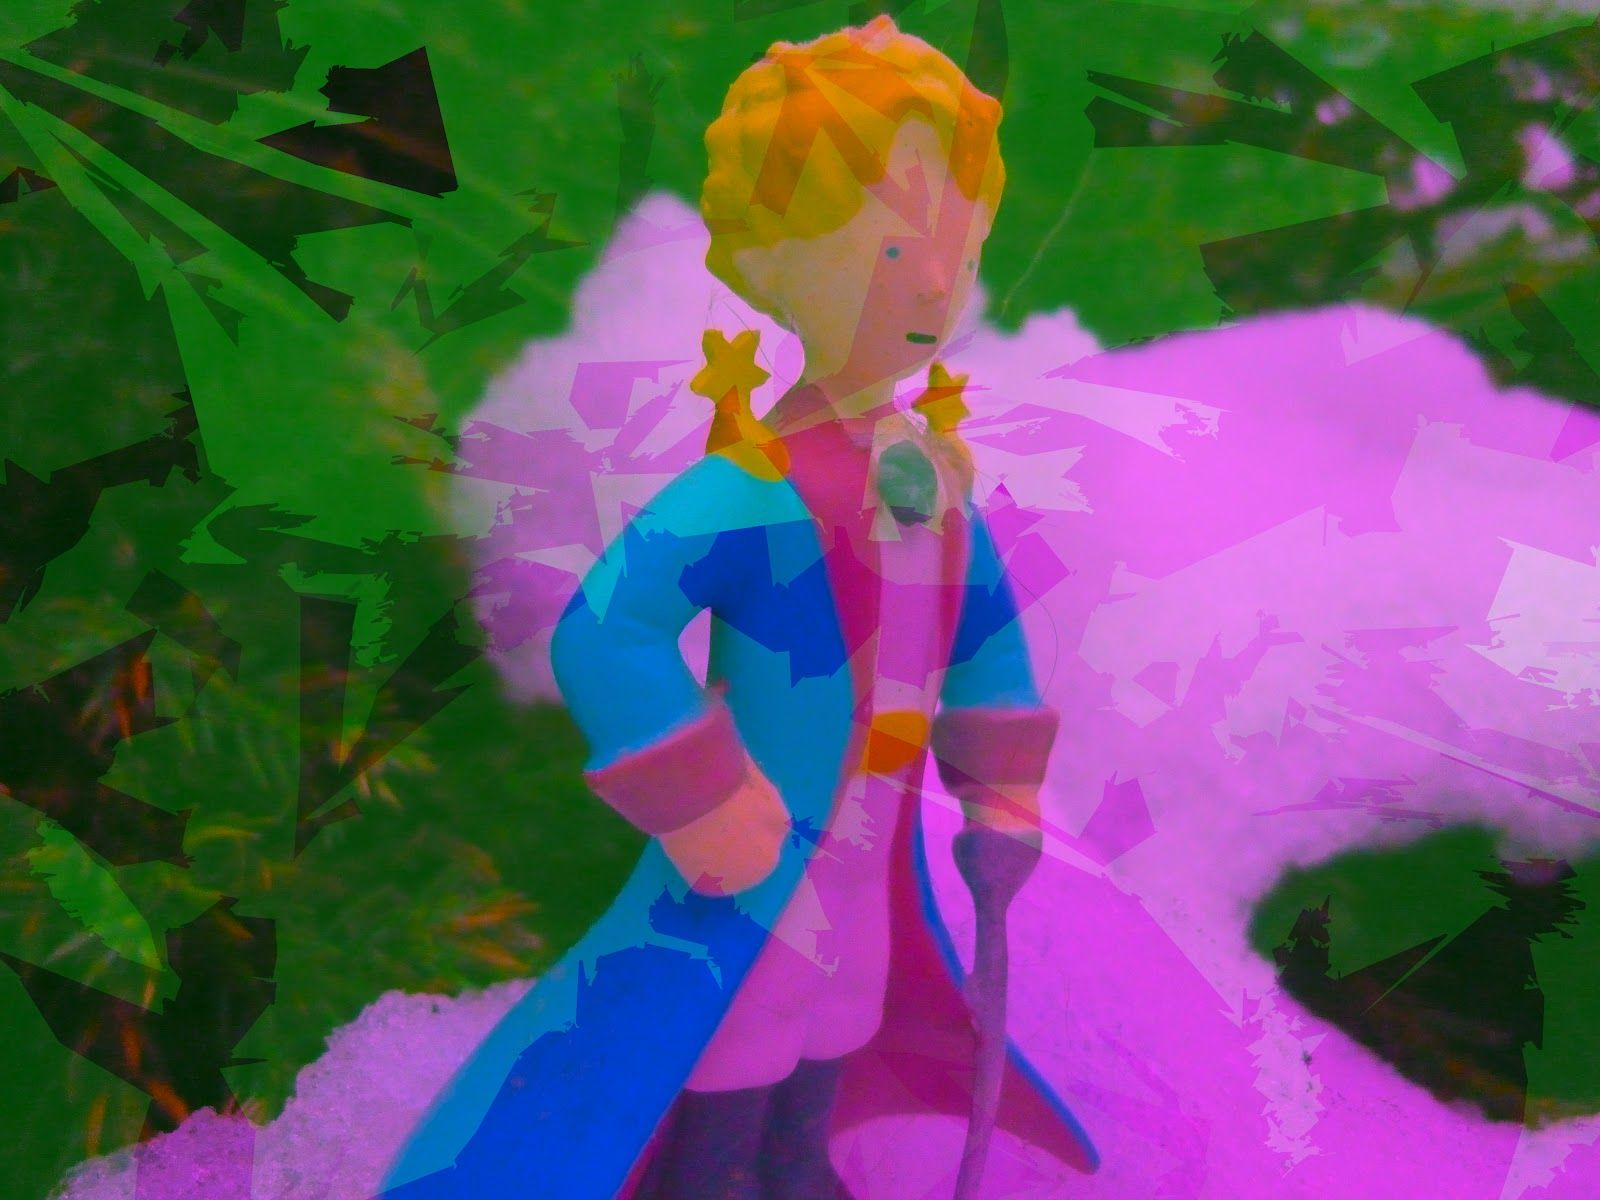 Toyart: The Little Prince